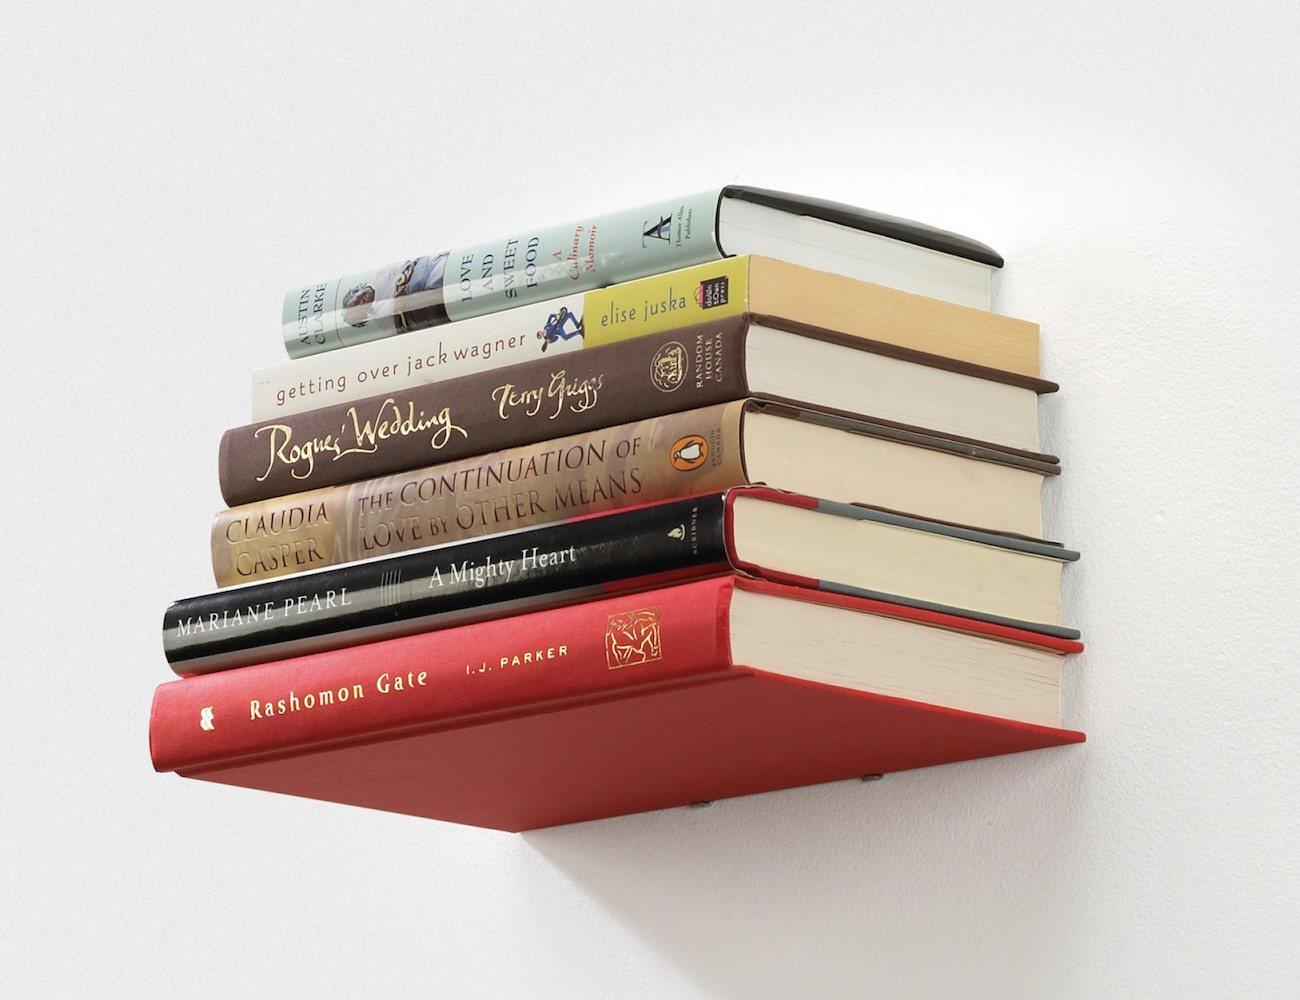 Fly-brary+Book+Shelf